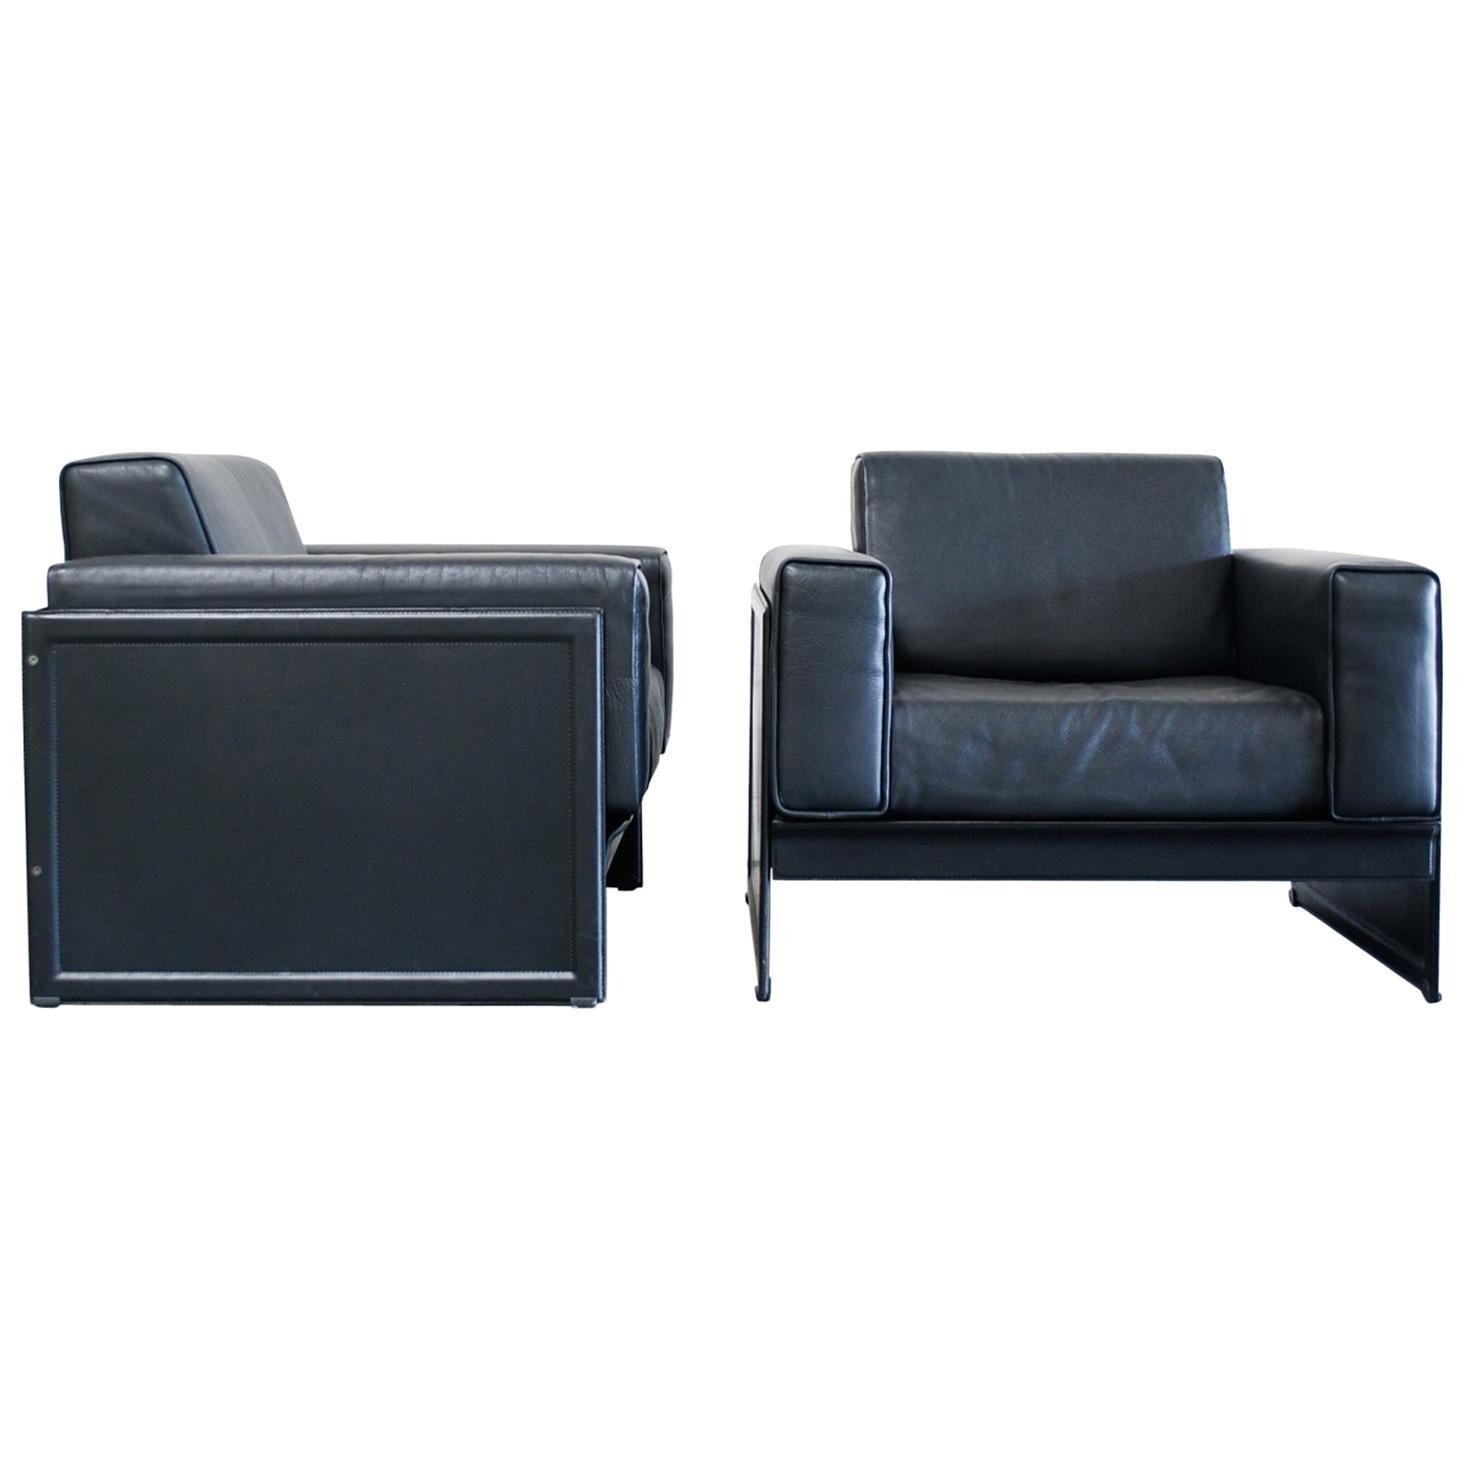 Matteo Grassi Korium Leather Armchair or Chair Korium by Tito Agnoli